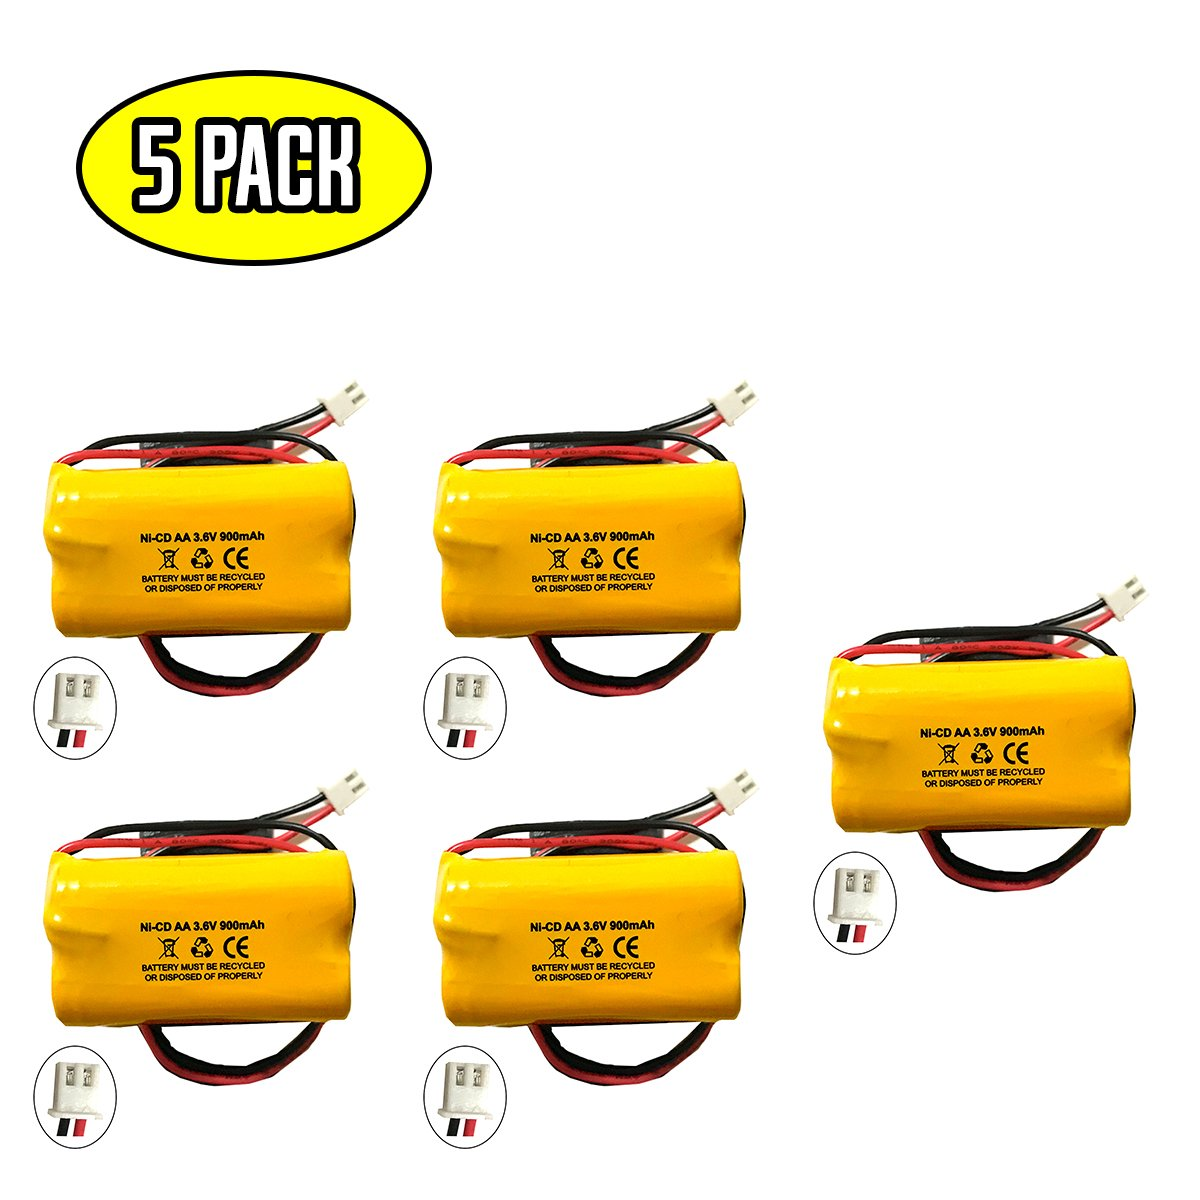 Lowes OSA230 3.6v 900mAh Battery Replacement Exit Sign Emergency Light NiCad Unitech 6200RP Lowes 253799 Unitech AA900MAH 6200-RP Unitech LEDR-1